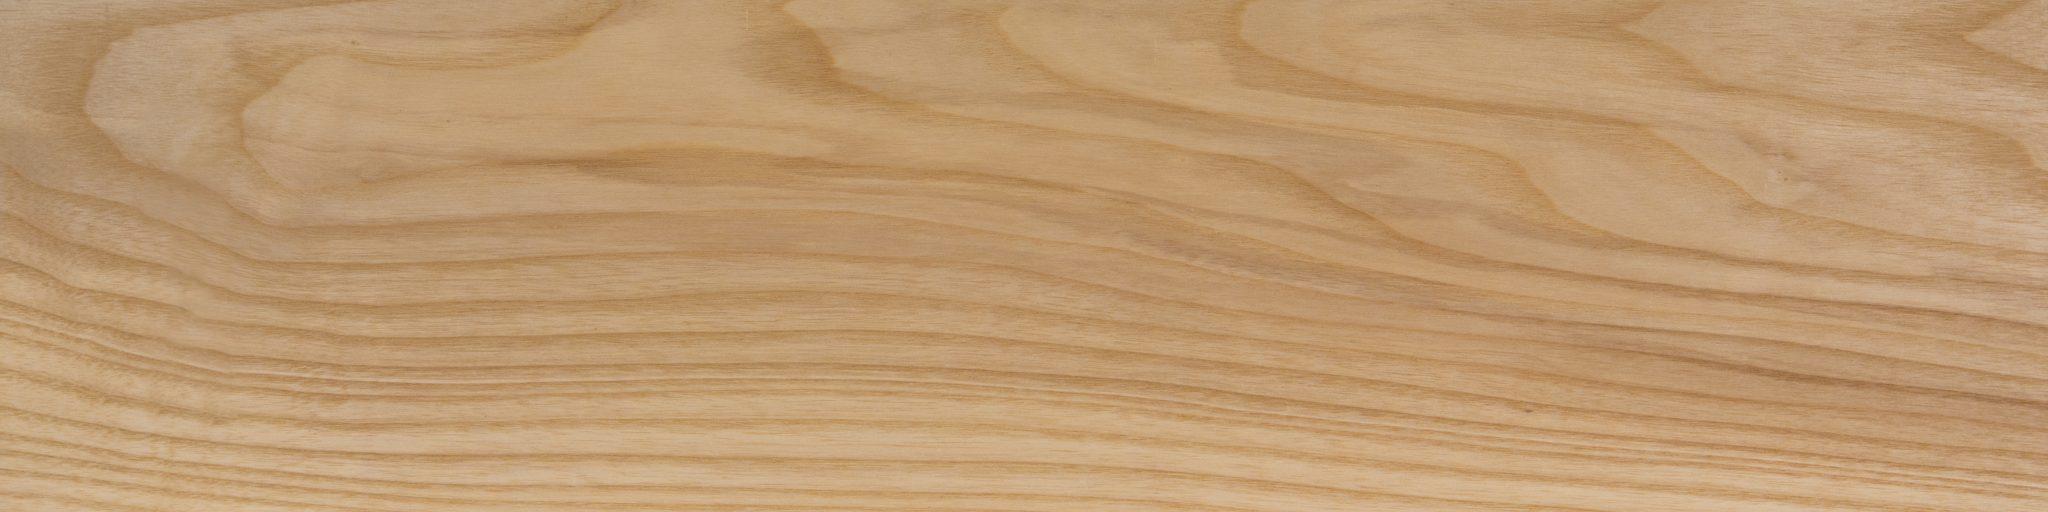 Wholesale Ash Hardwood Flooring